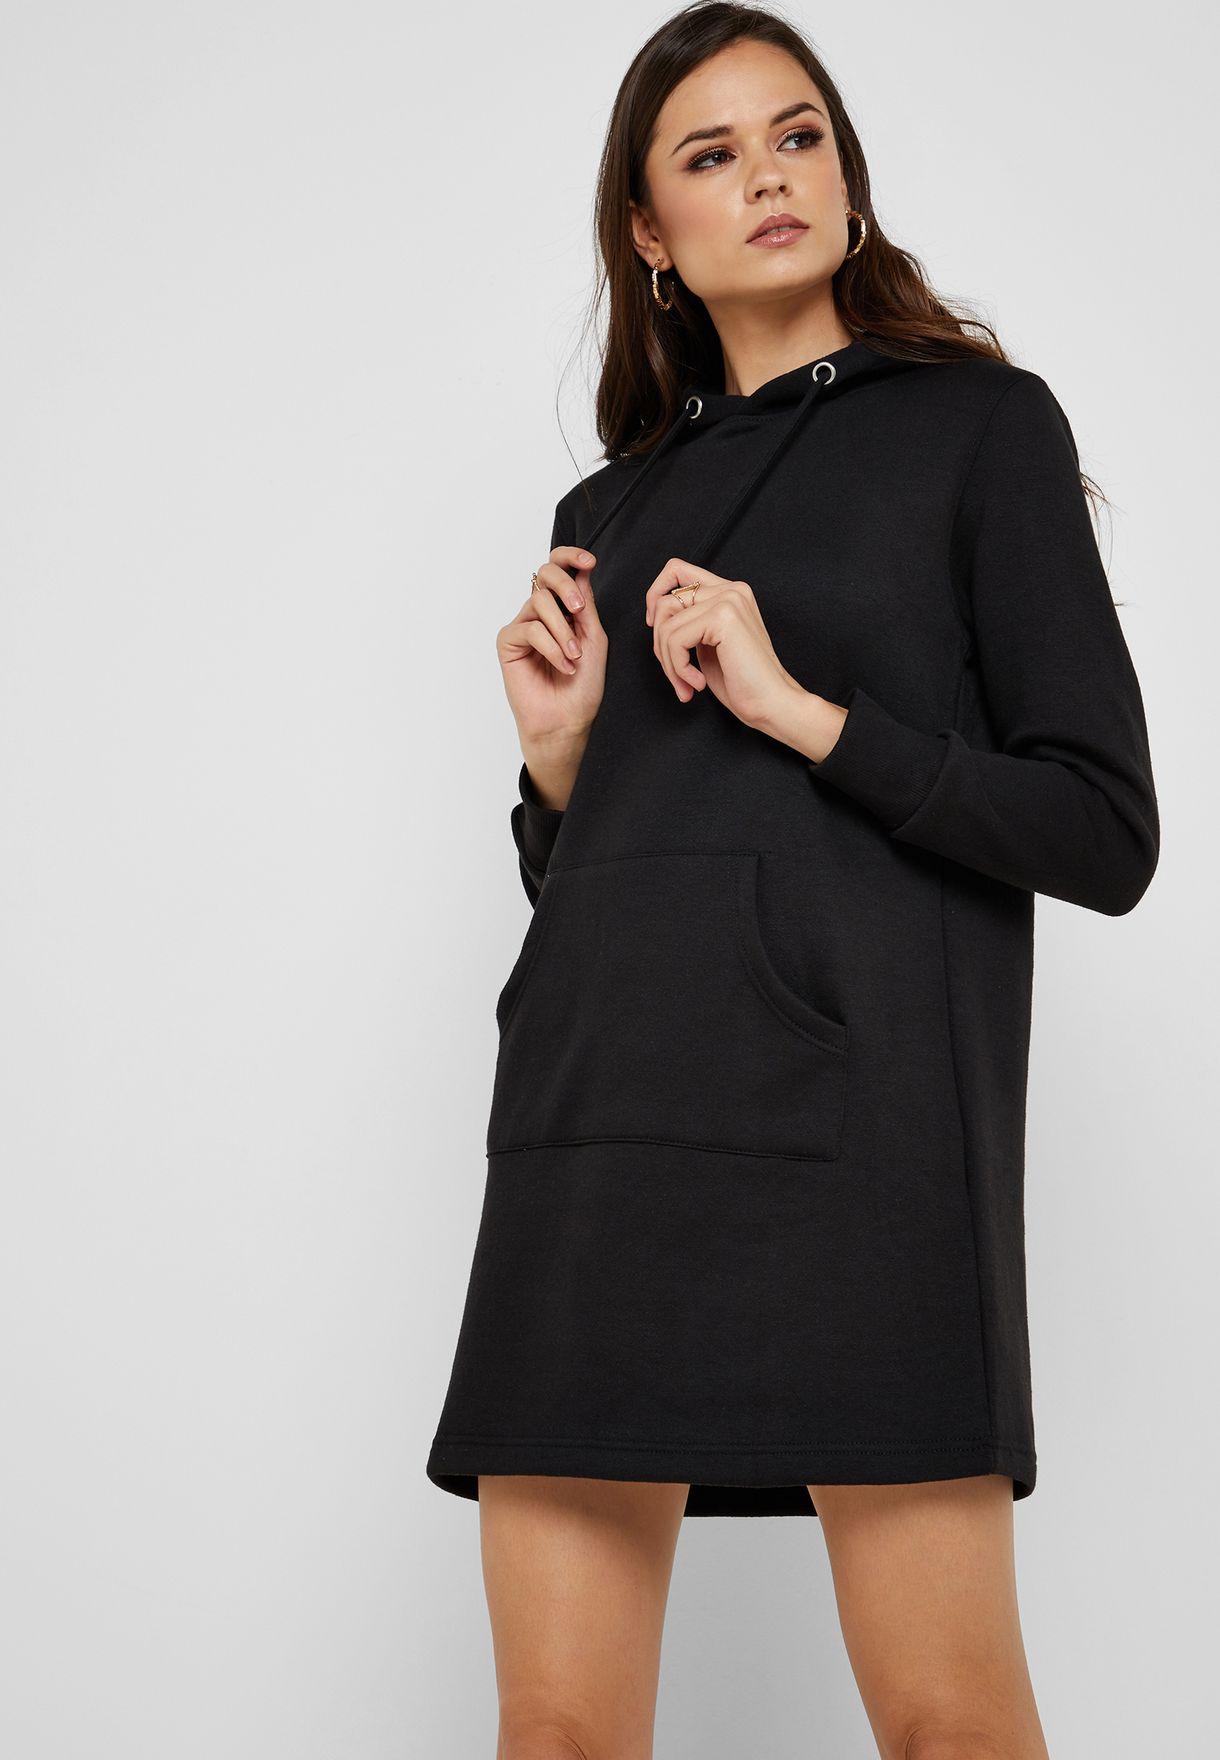 bee20f2a7fa Shop Ginger black Hooded Sweatshirt Mini Dress LDRJ-531TACHABLK for Women  in UAE - 11096AT33PIP